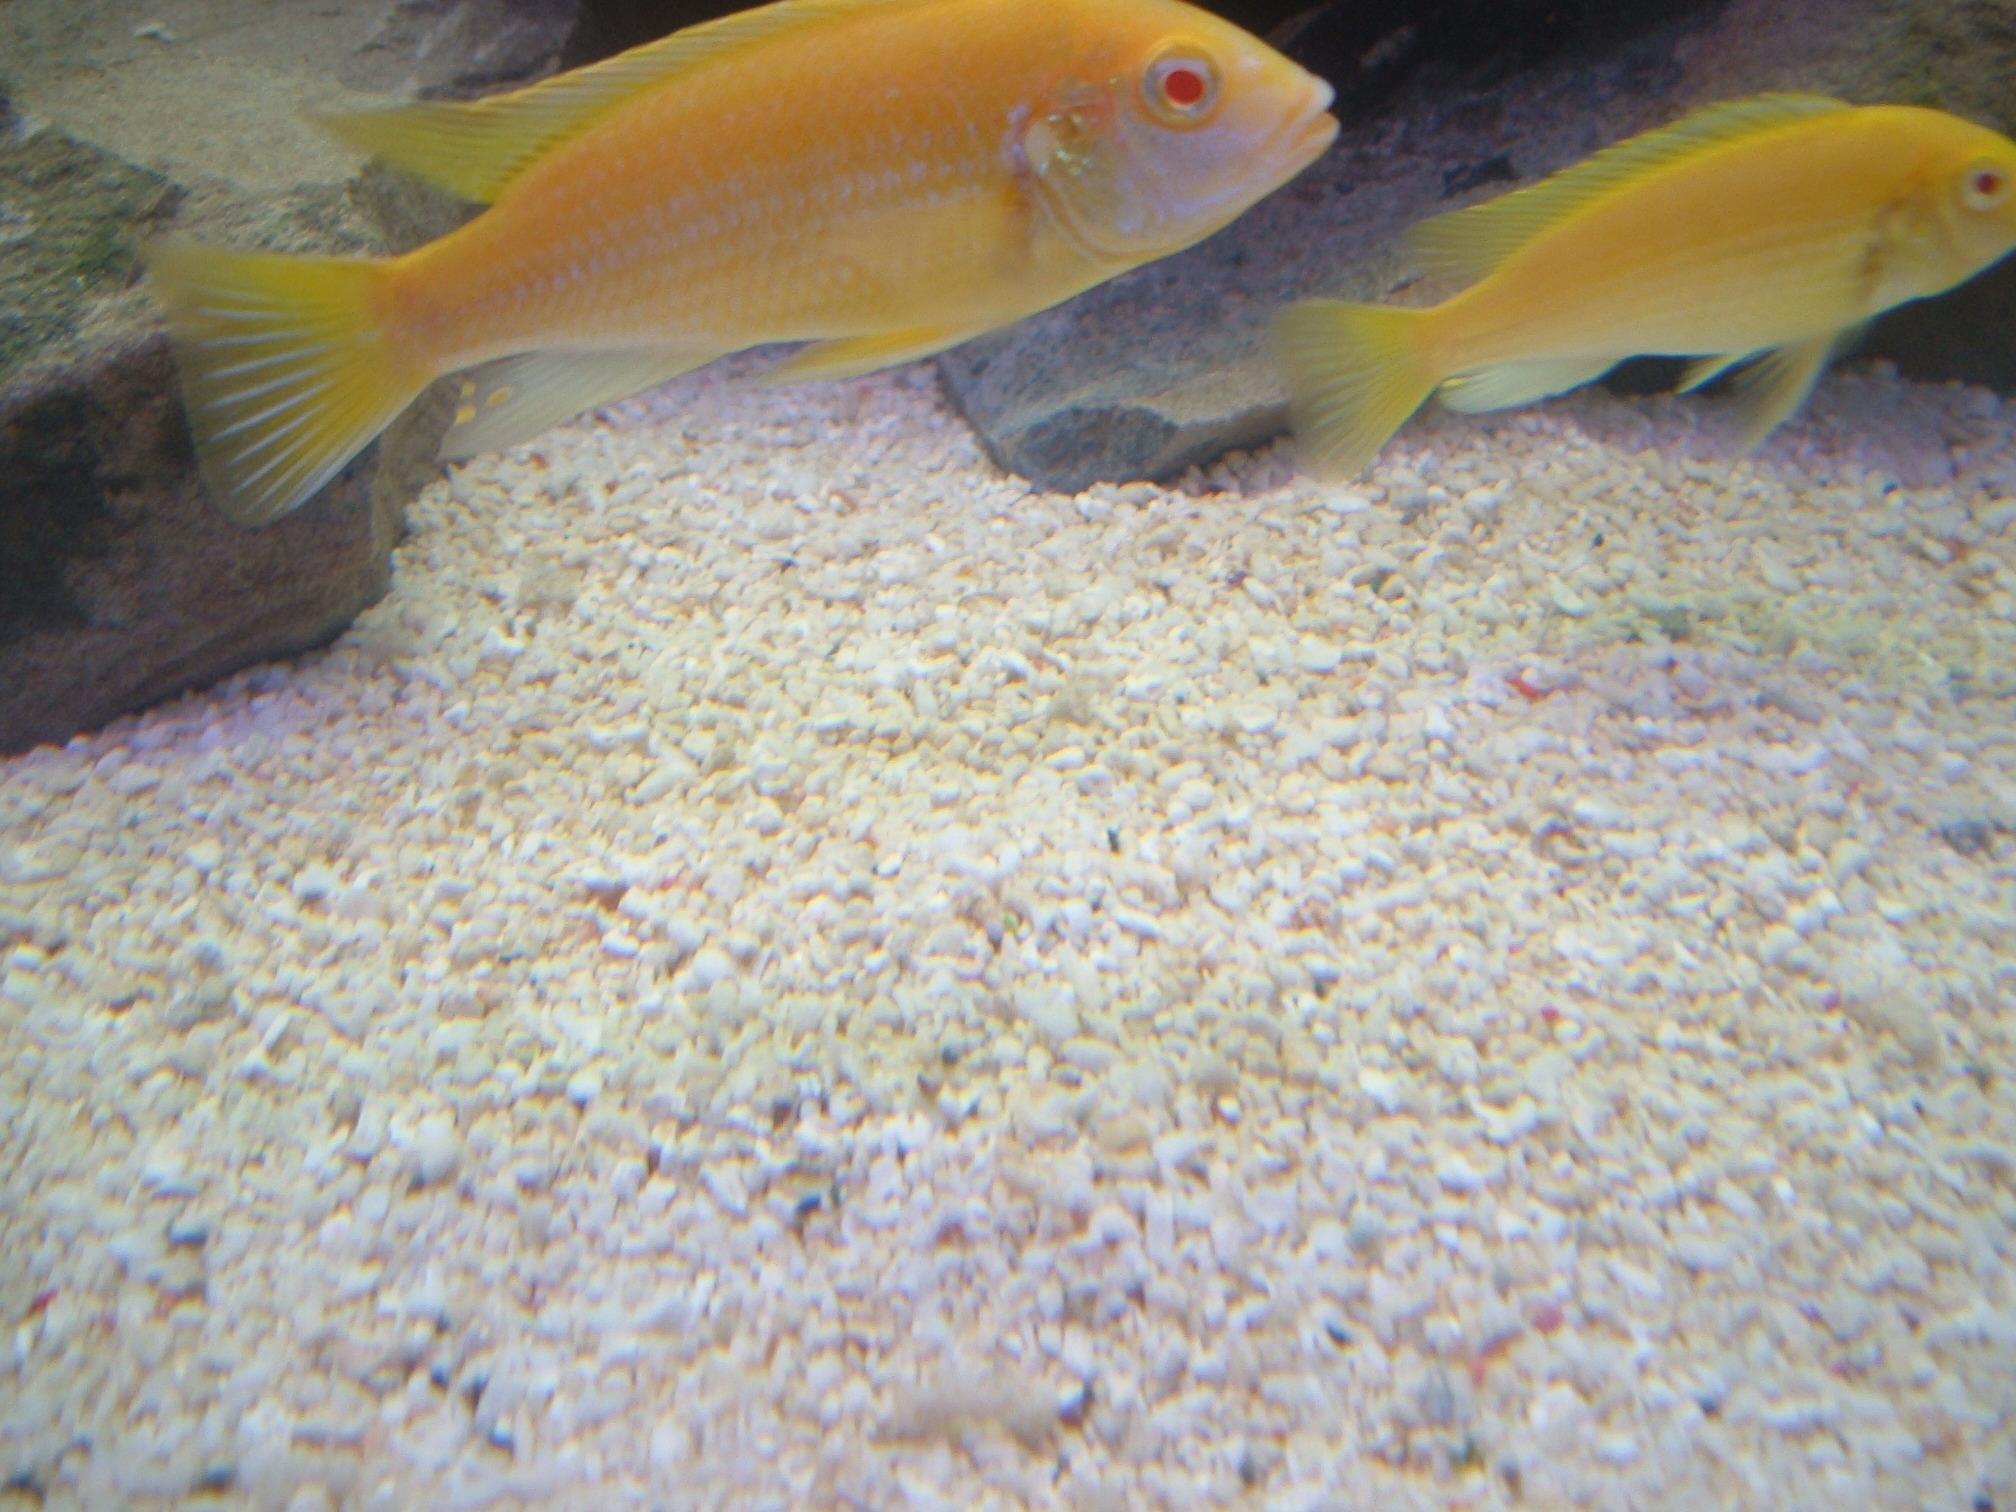 cichlids.com: Albino yellow lab?